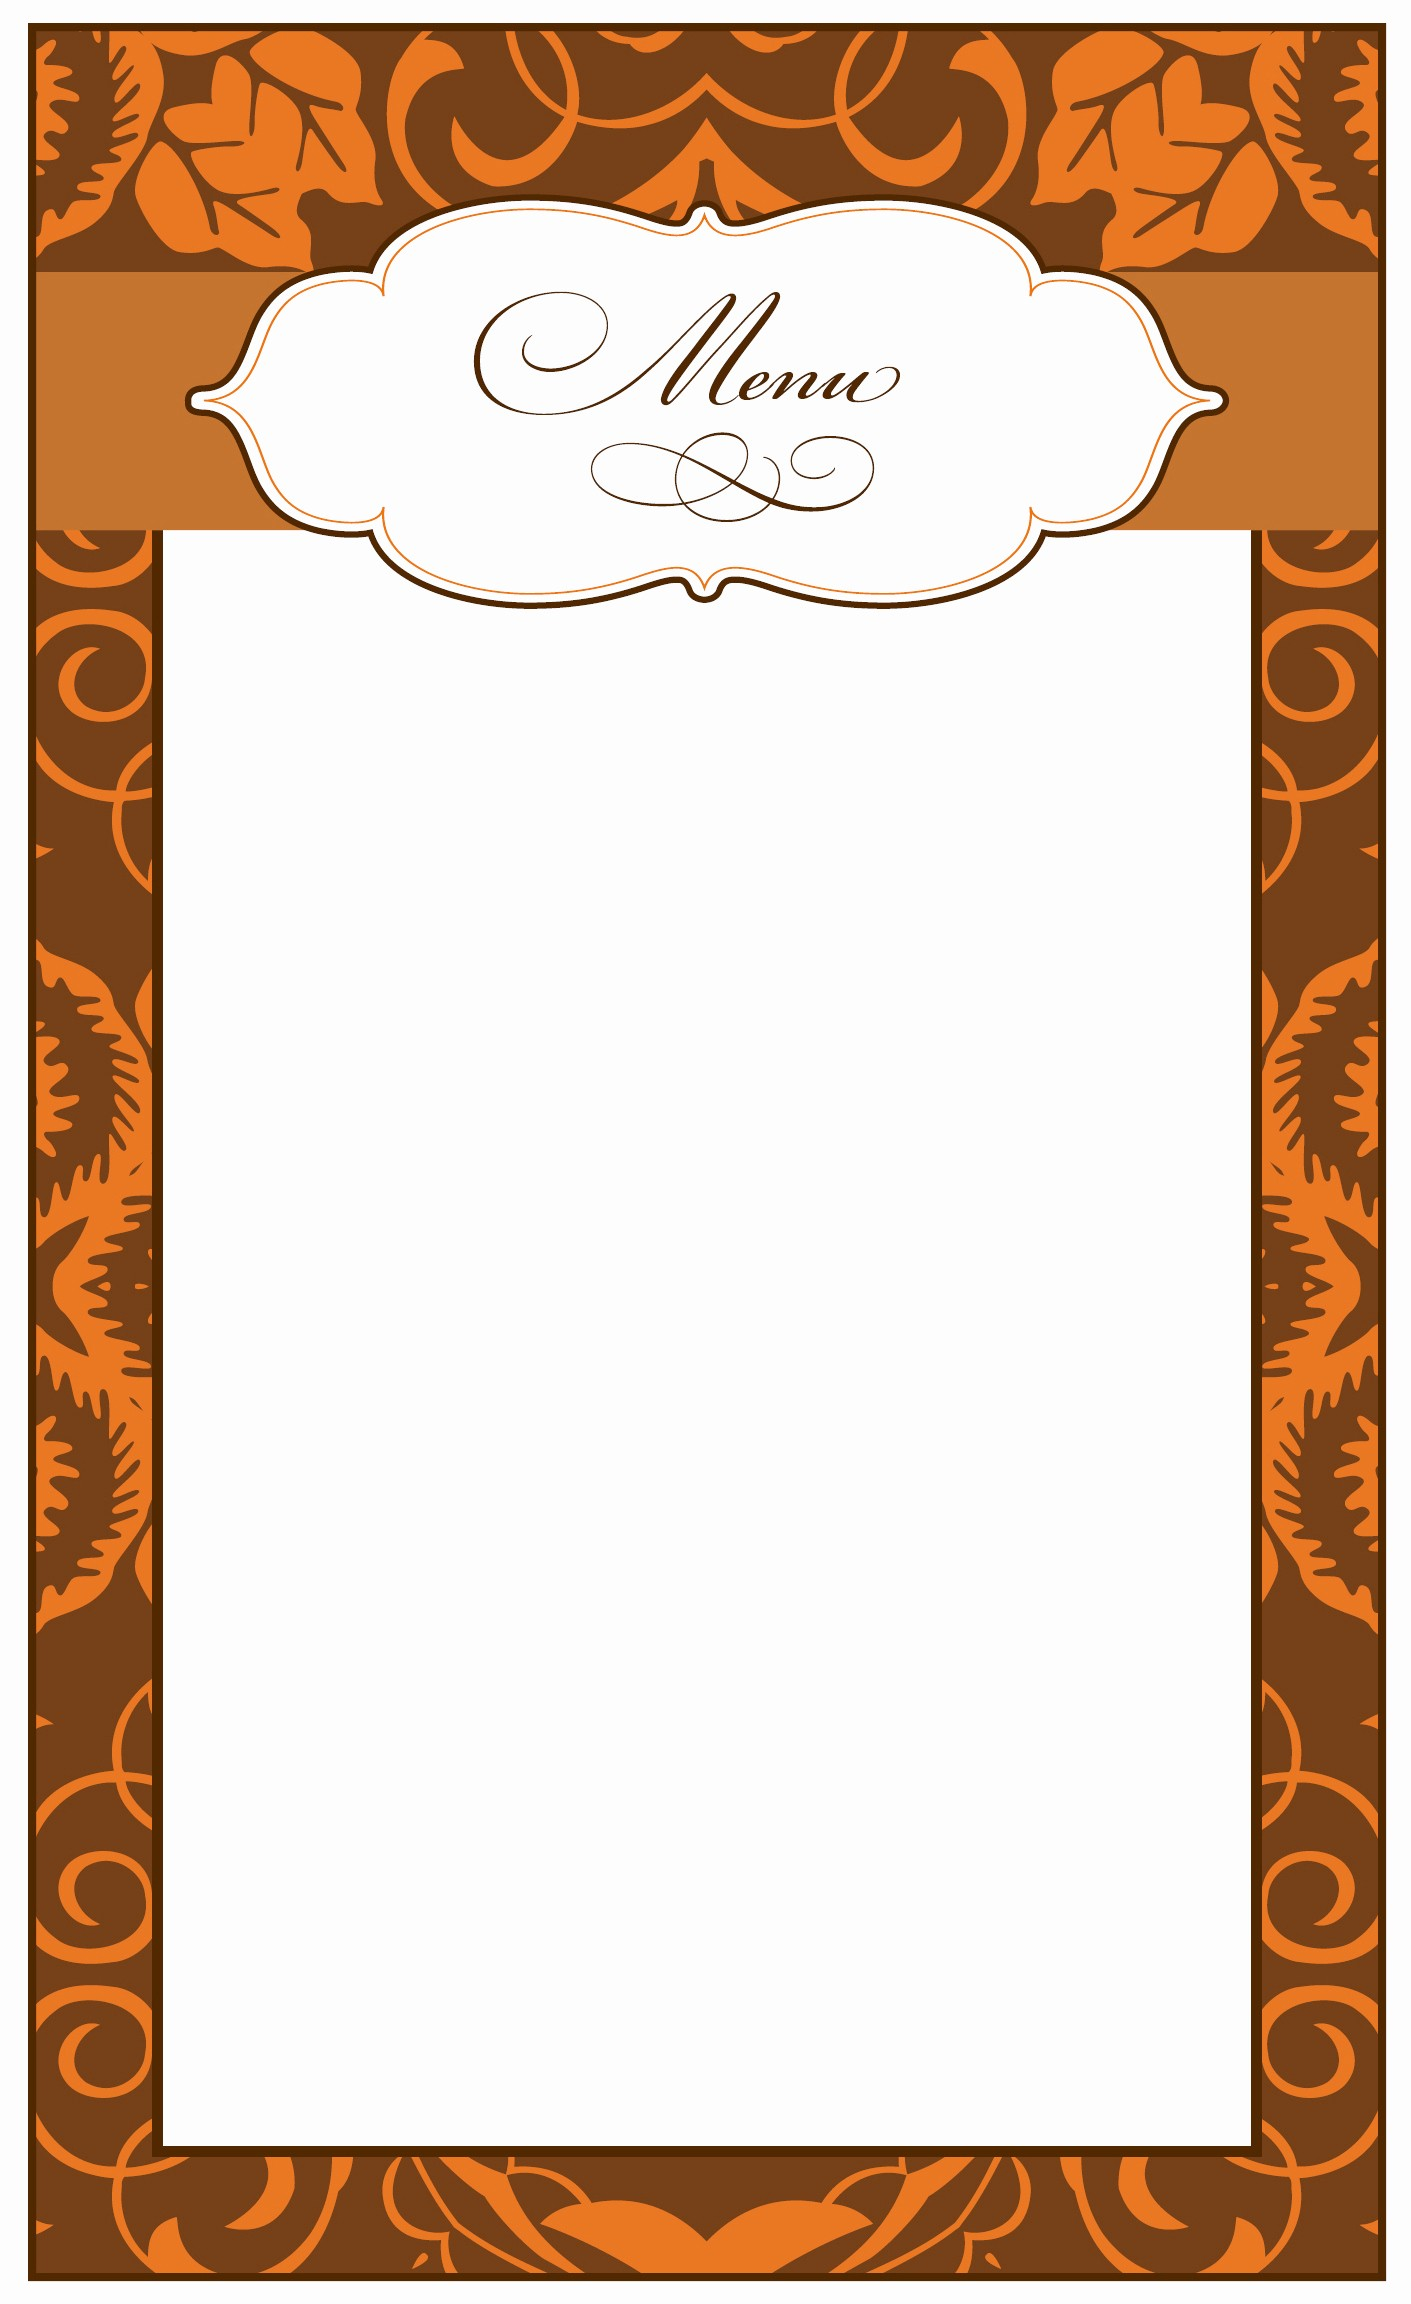 Printable Thanksgiving Menu Template Free Luxury 8 Best Of Printable Thanksgiving Menu Blank